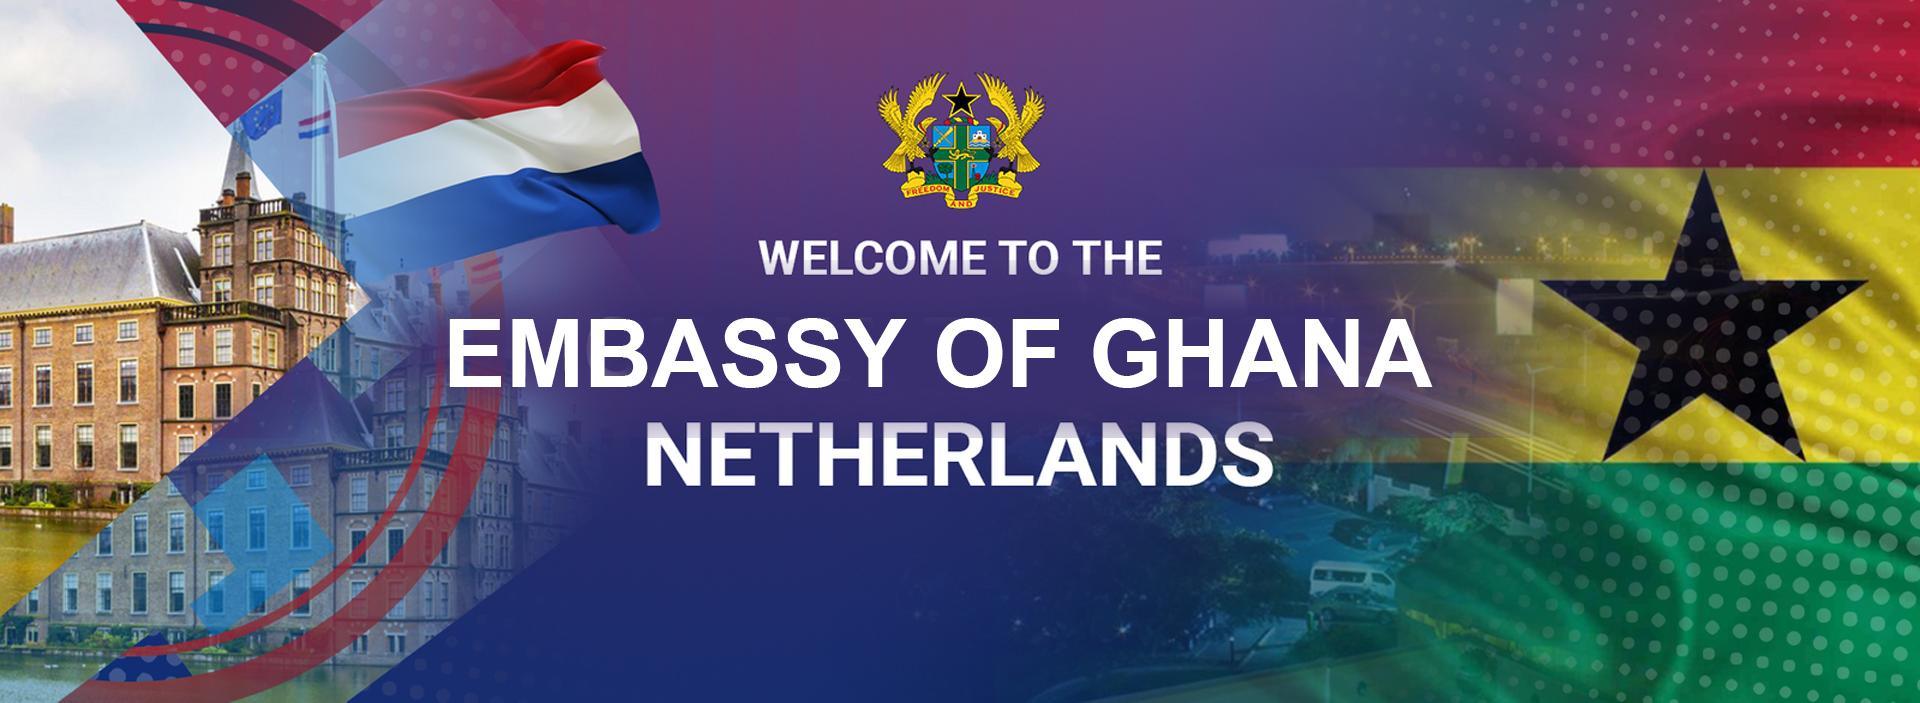 Ghana Embassy Hague